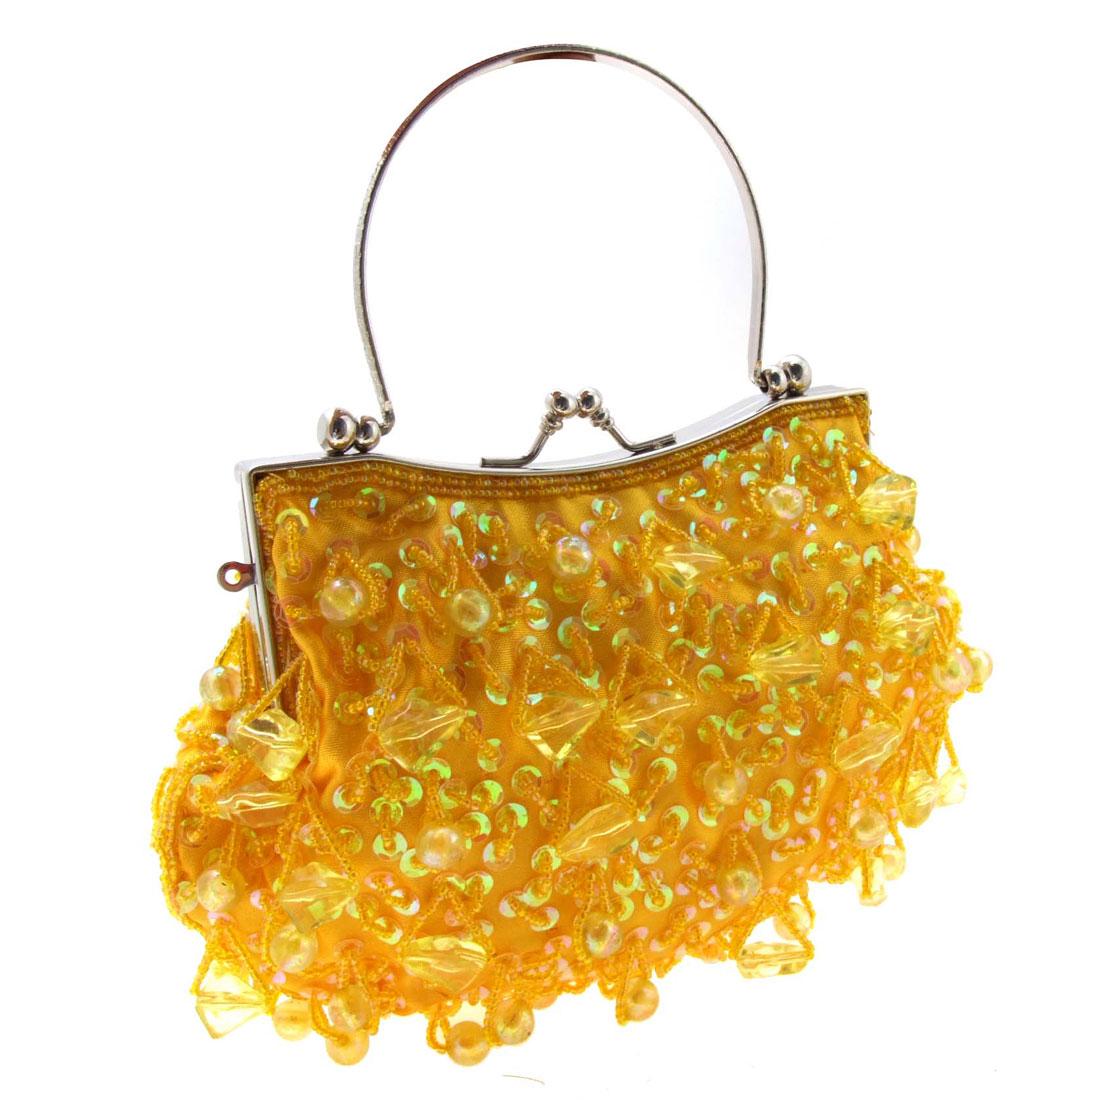 Ladylike Women Bag Handbag w/Beads/Sequins/Inner Purse